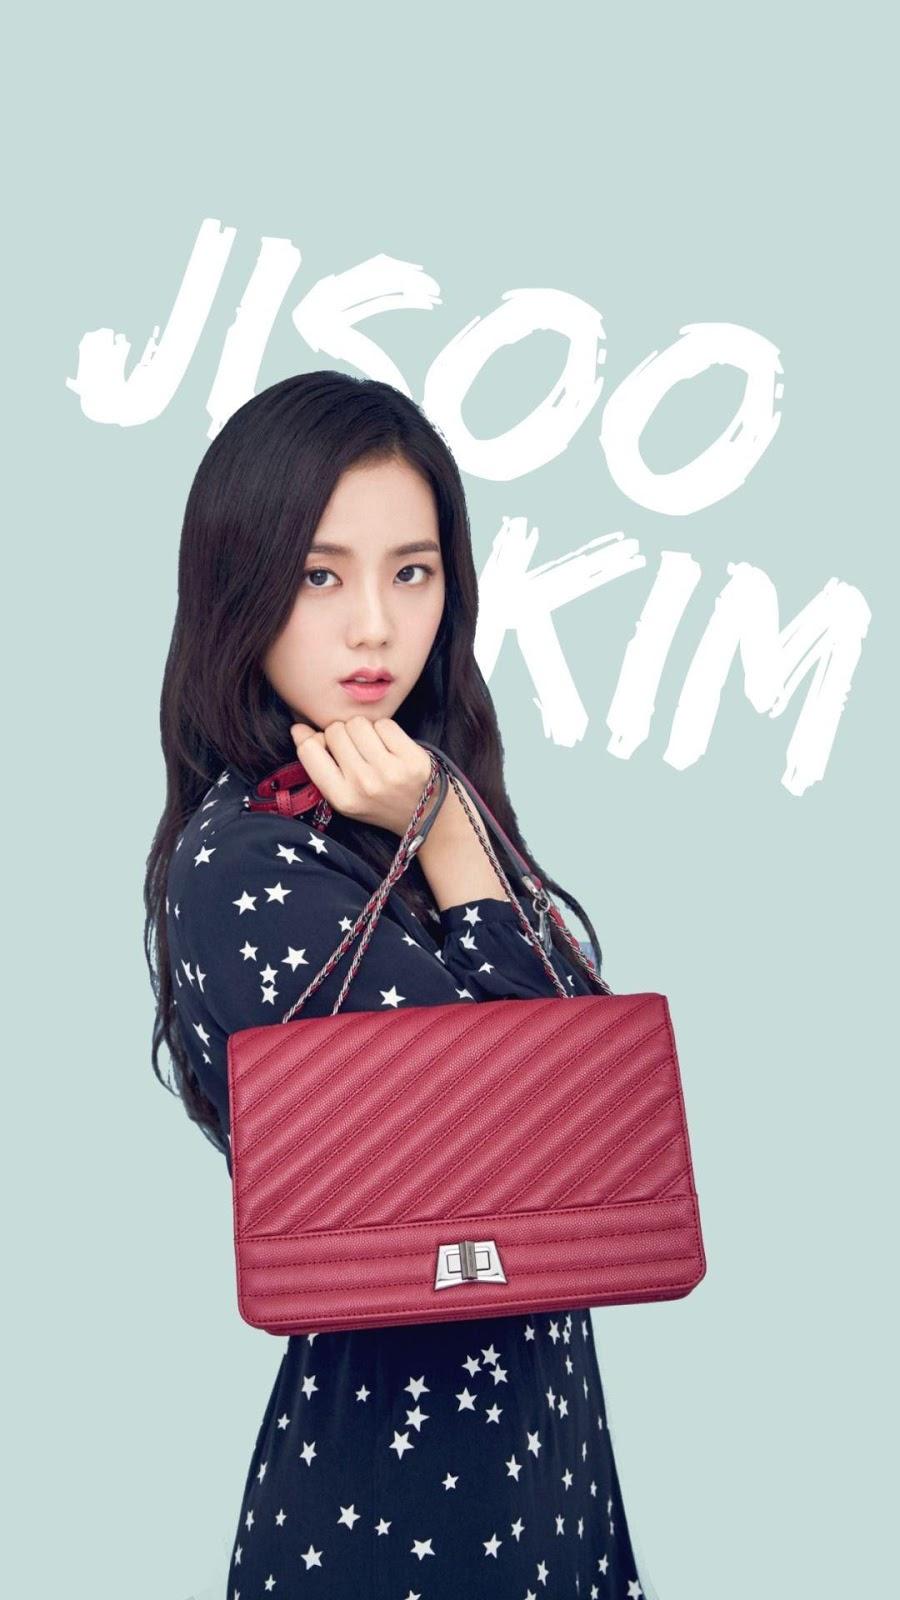 Blackpink Jisoo Wallpapers